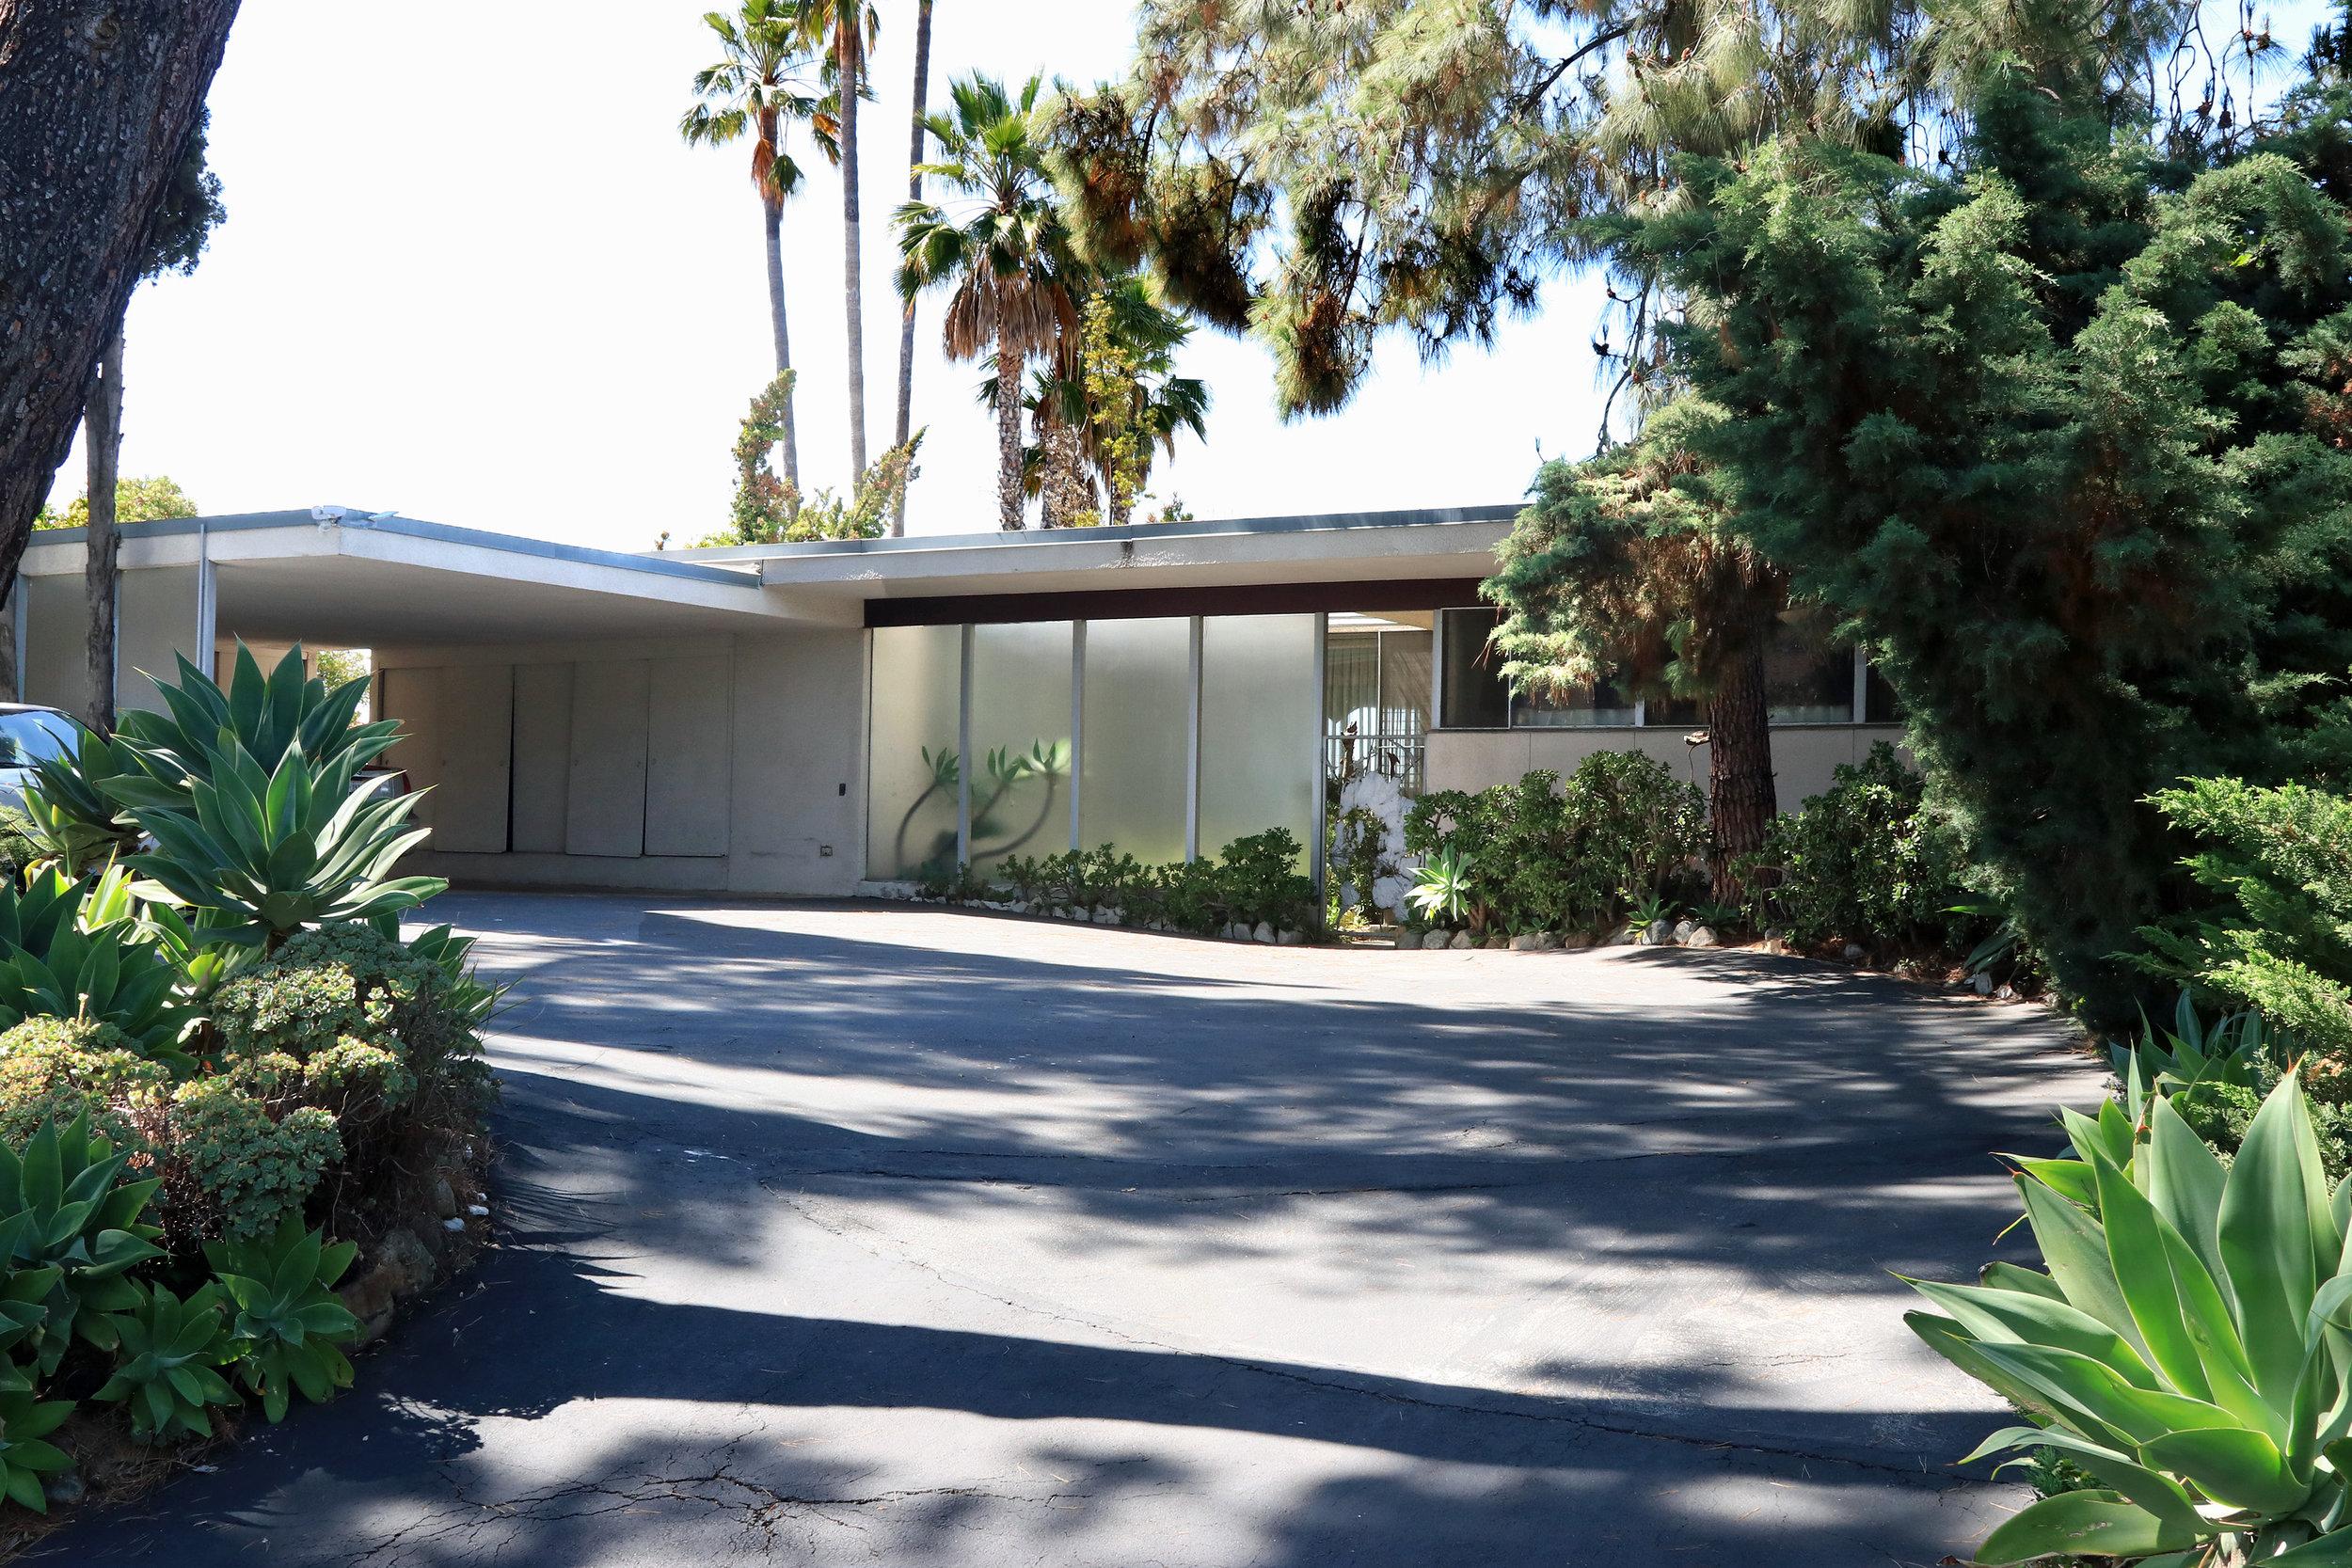 Erman House     Richard Neutra - 1961